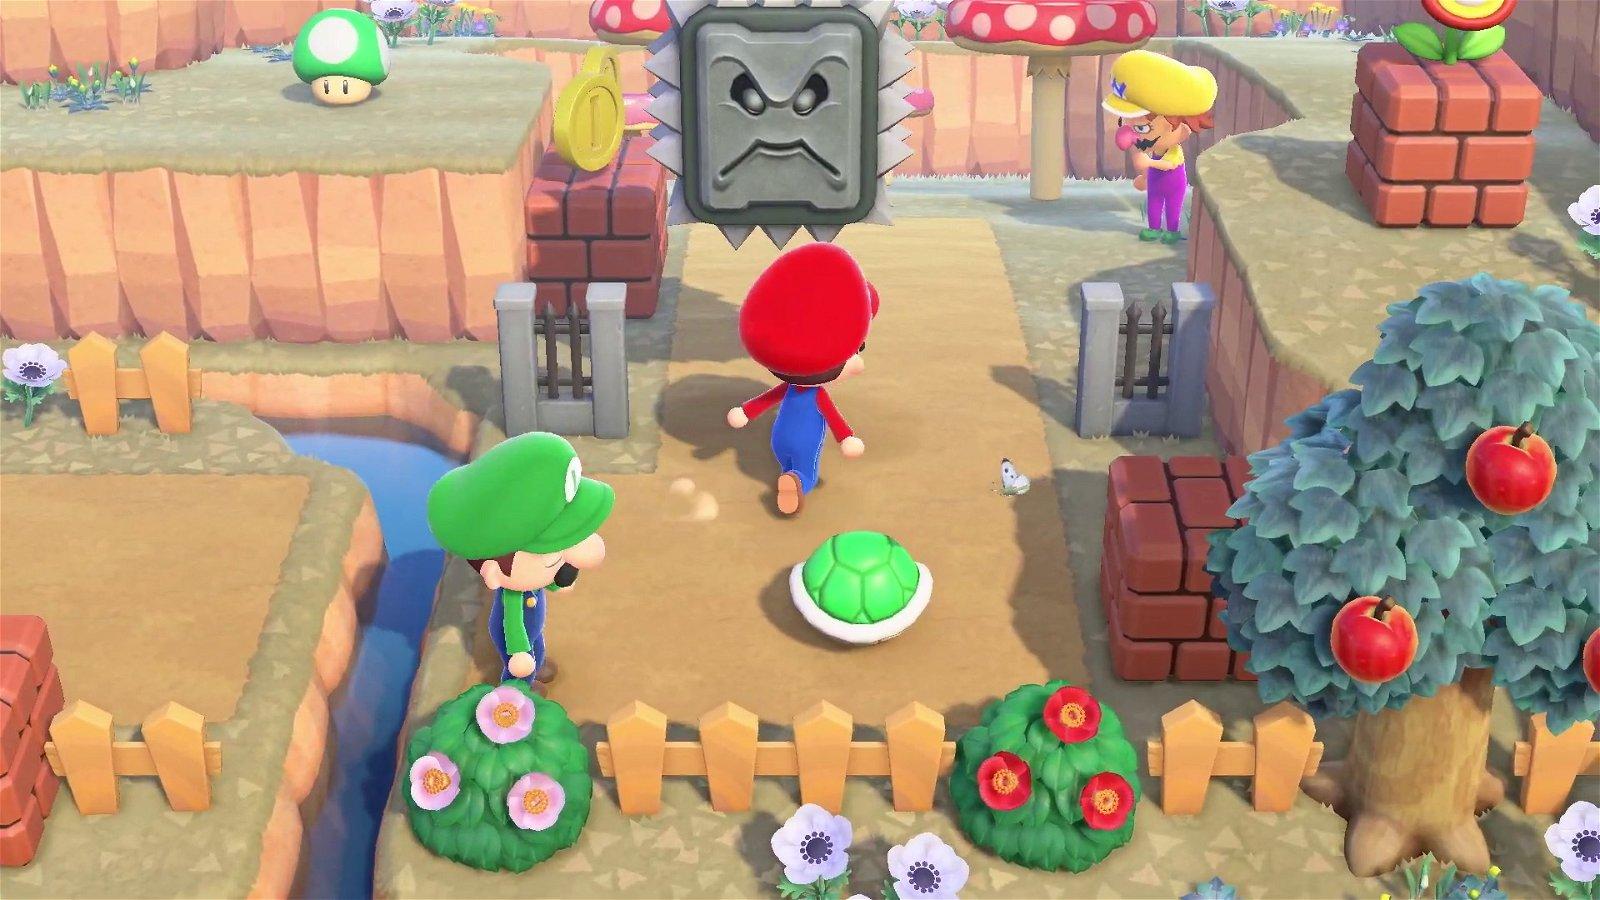 Super Mario Making its way to Animal Crossing: New Horizons